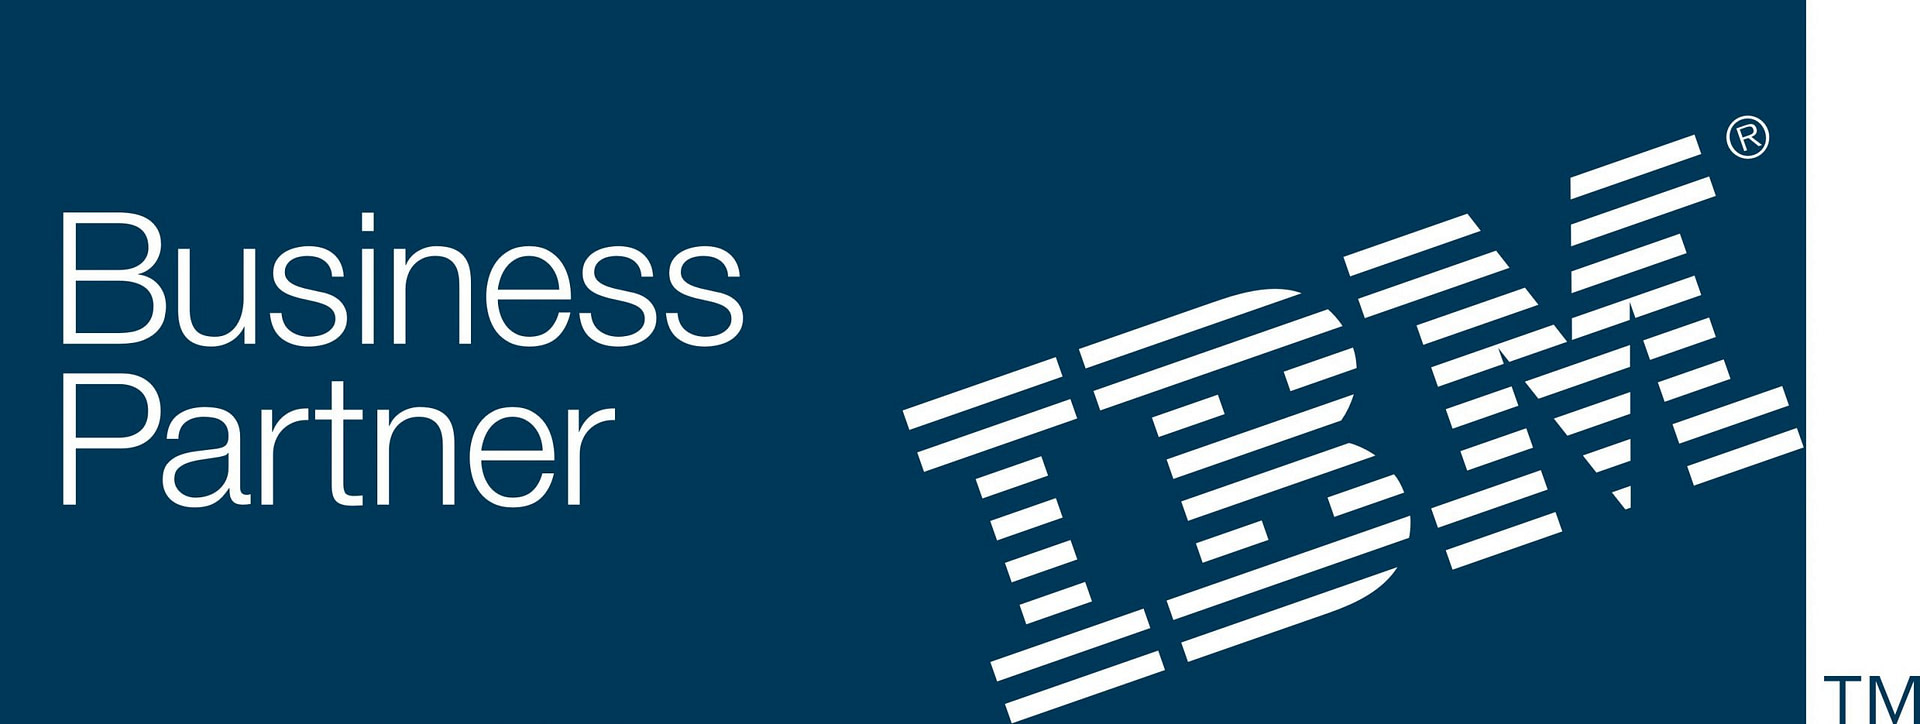 InterForm is IBM business partner output management